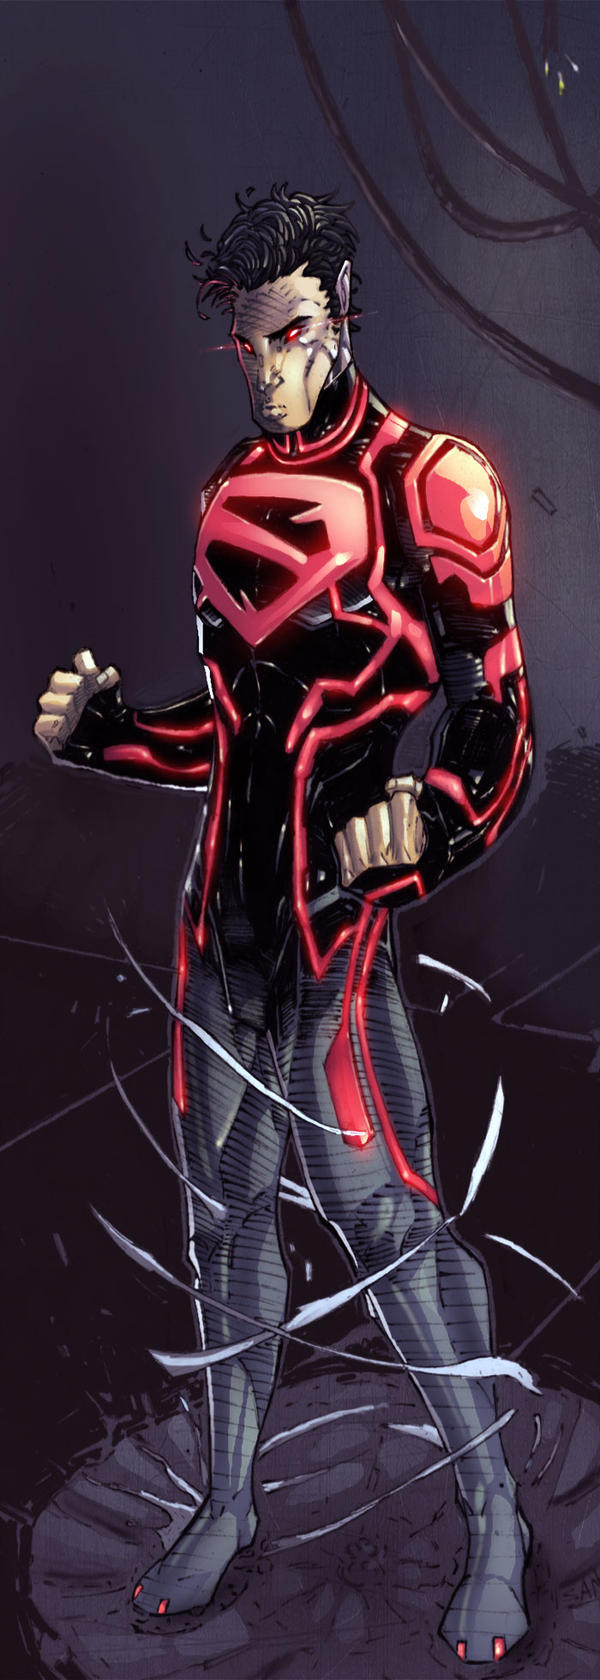 superboy new52 by CRISTIAN-SANTOS on DeviantArt